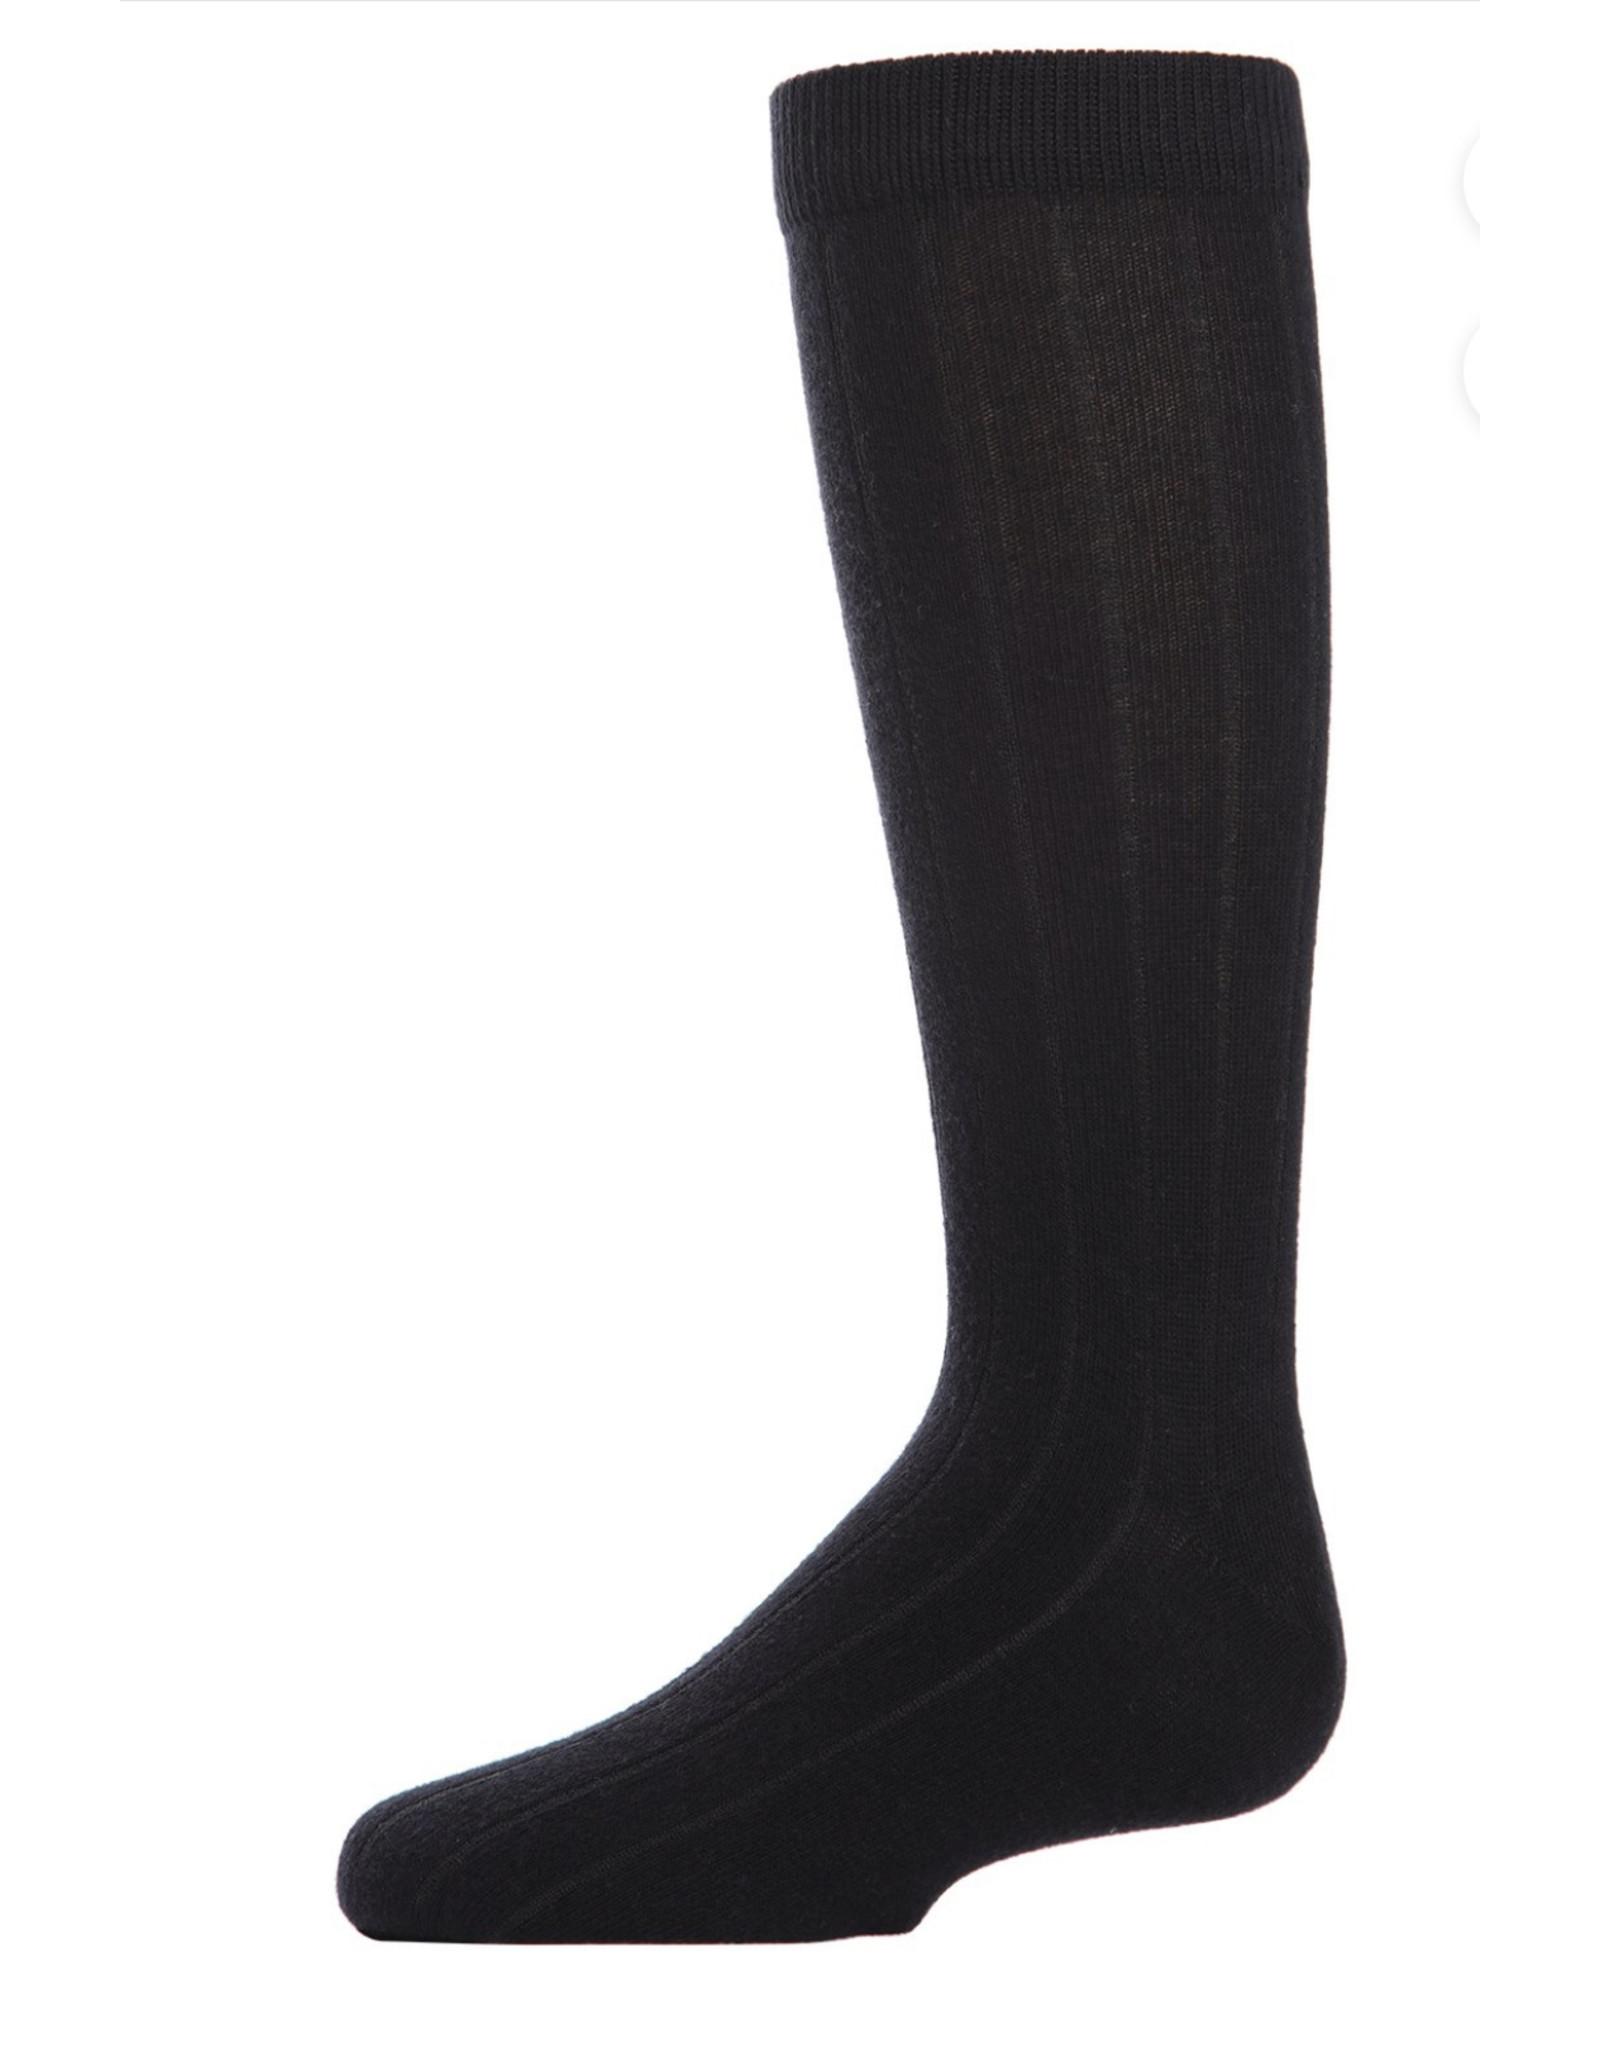 Memoi Memoi Ribbed 3- Pack Bamboo Blend Crew Socks